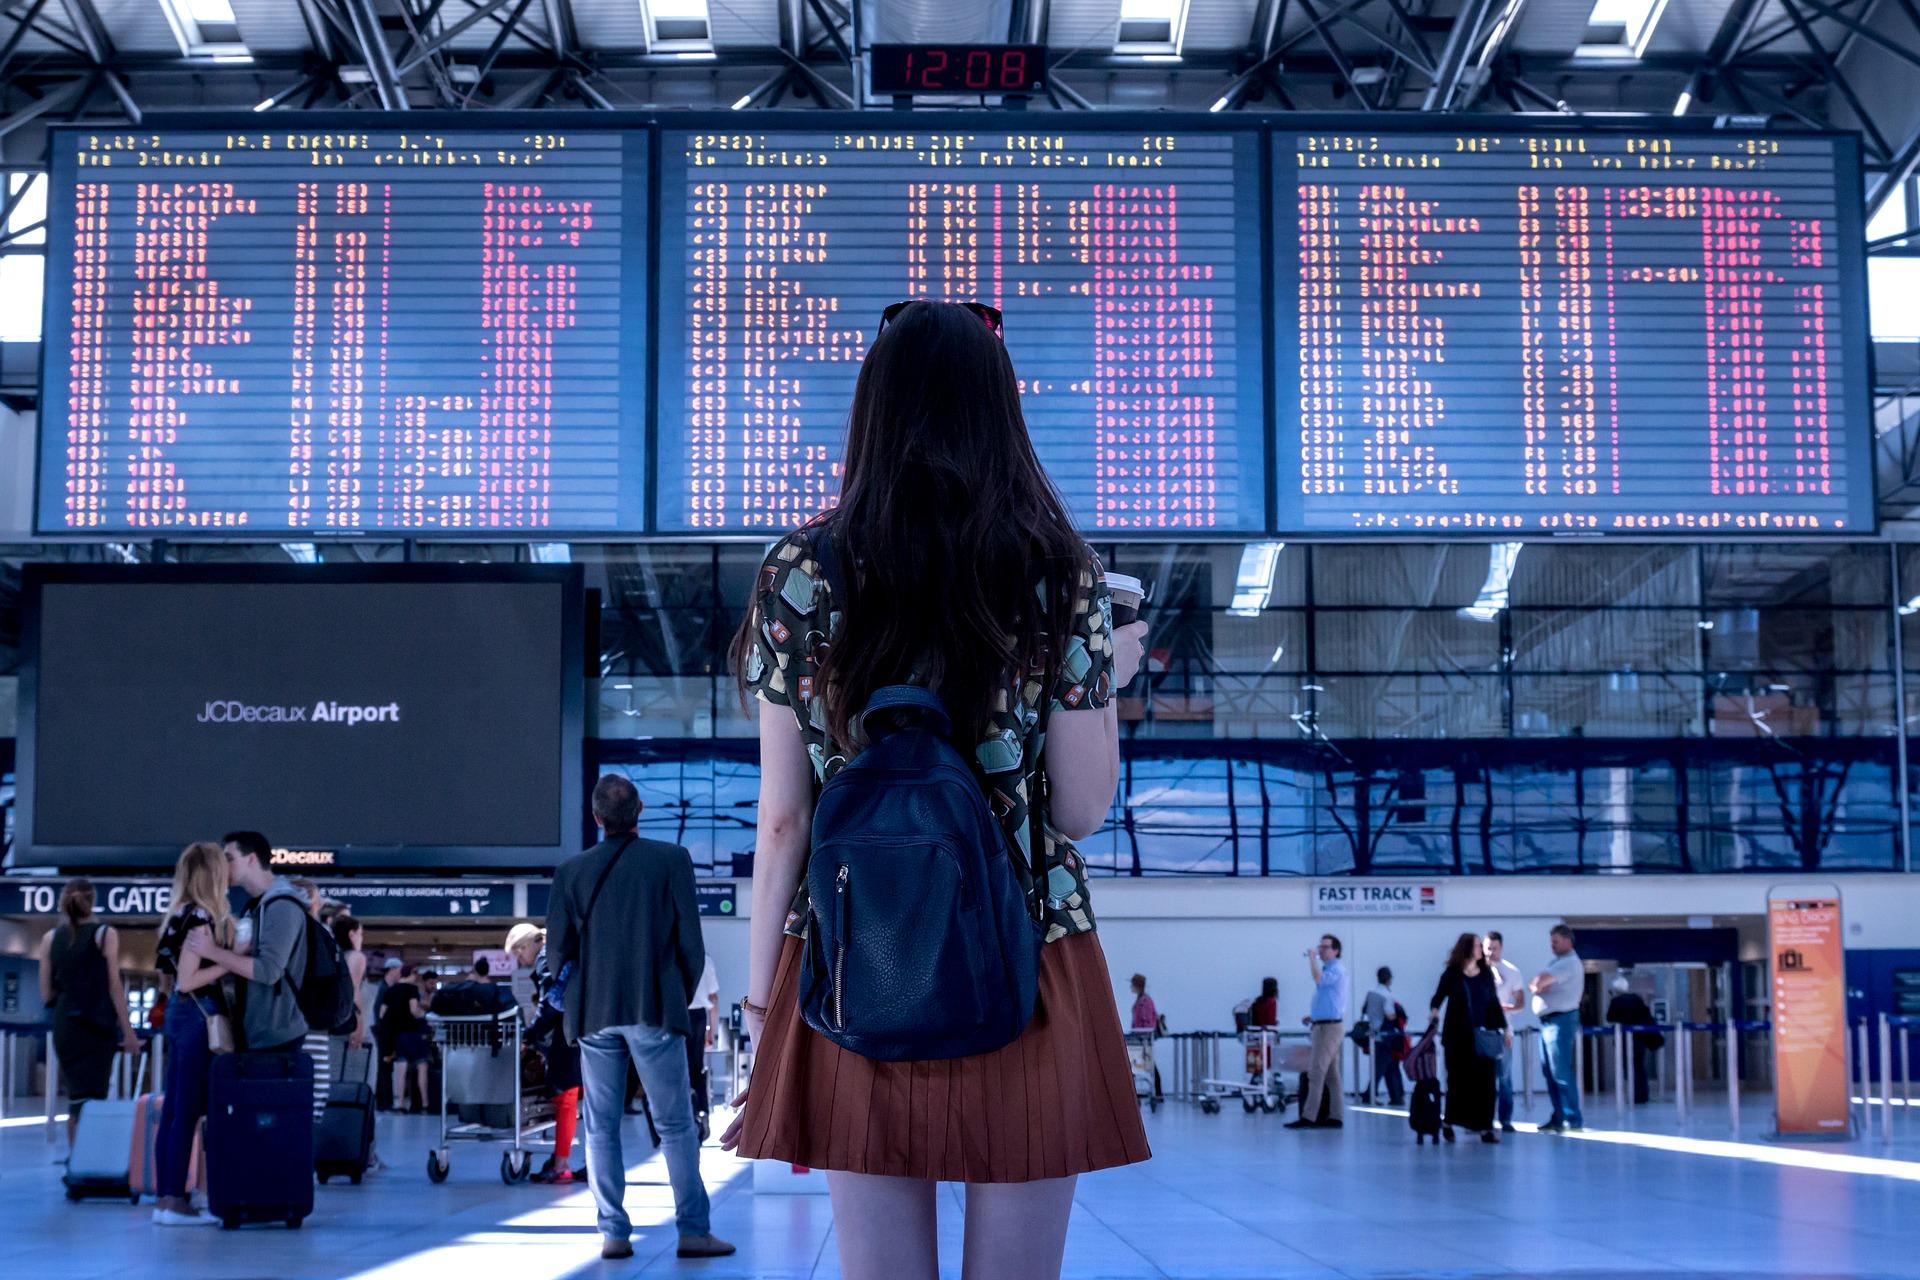 airport-2373727_1920-2-1507199733.jpg